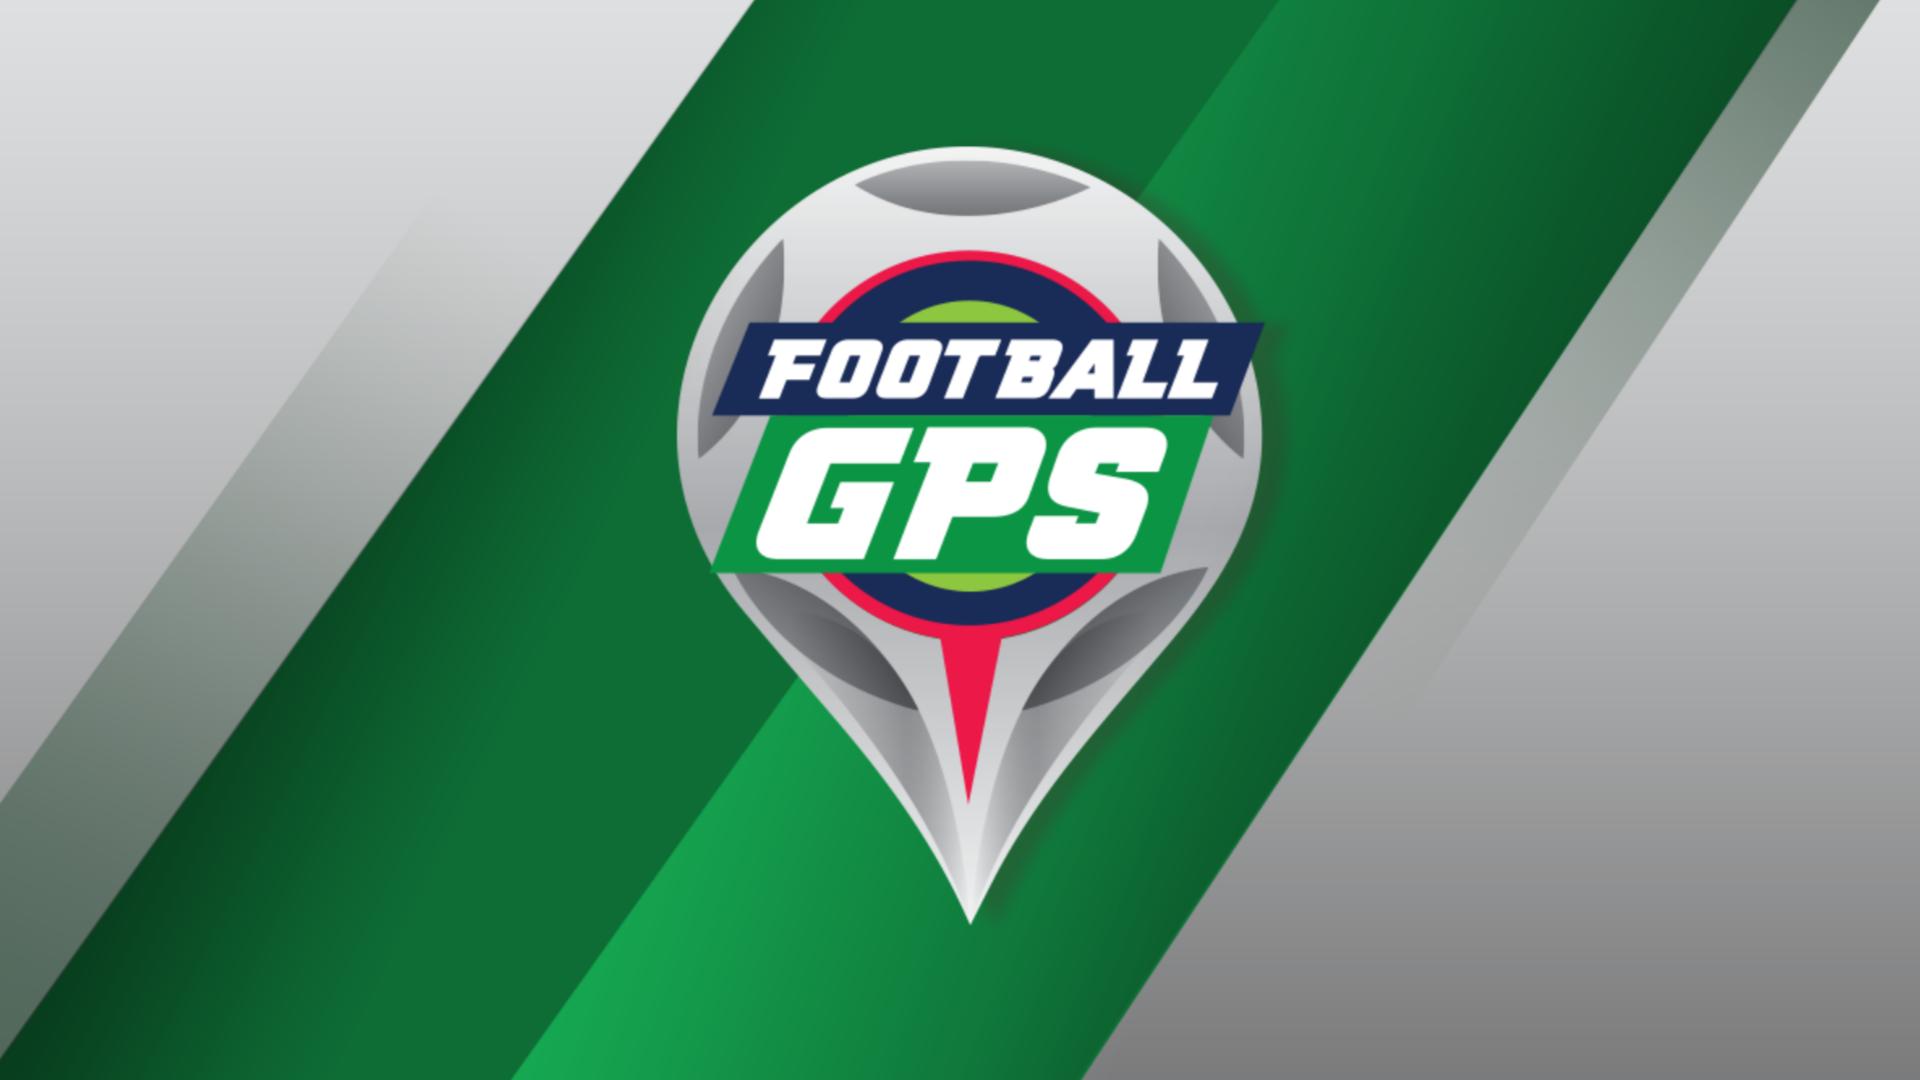 Football GPS